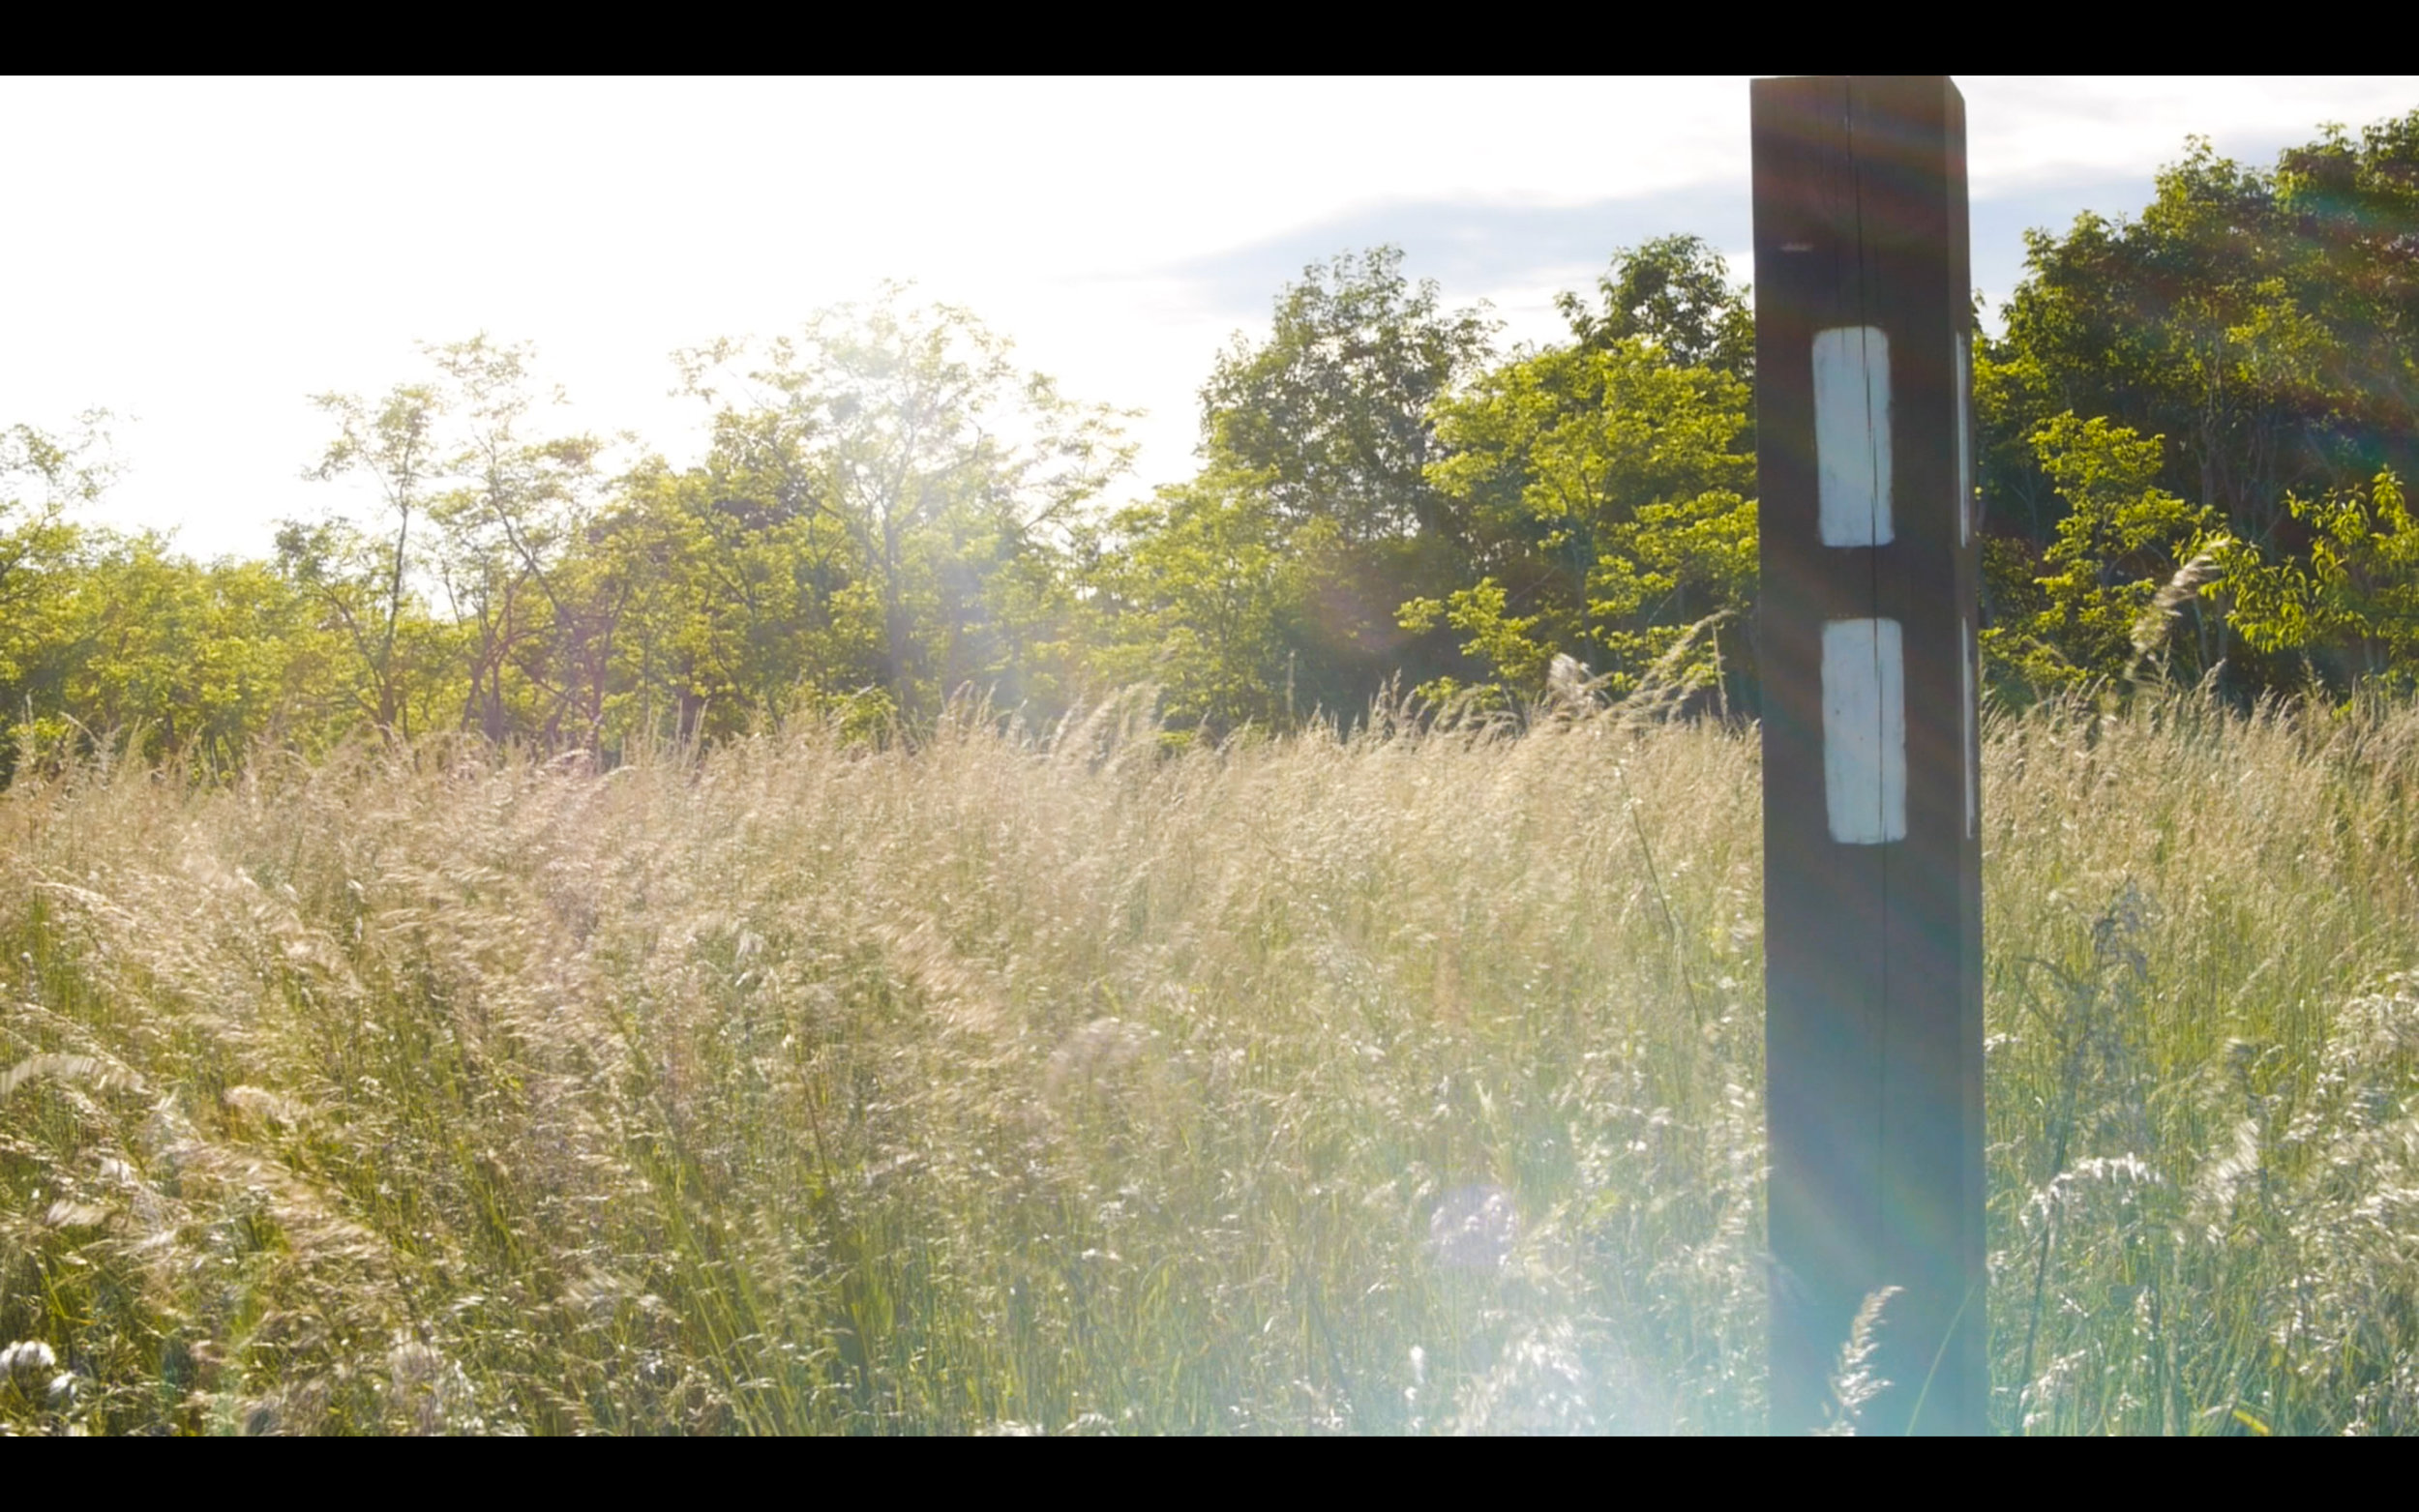 Screen Shot 2016-06-25 at 4.33.24 PM.jpg